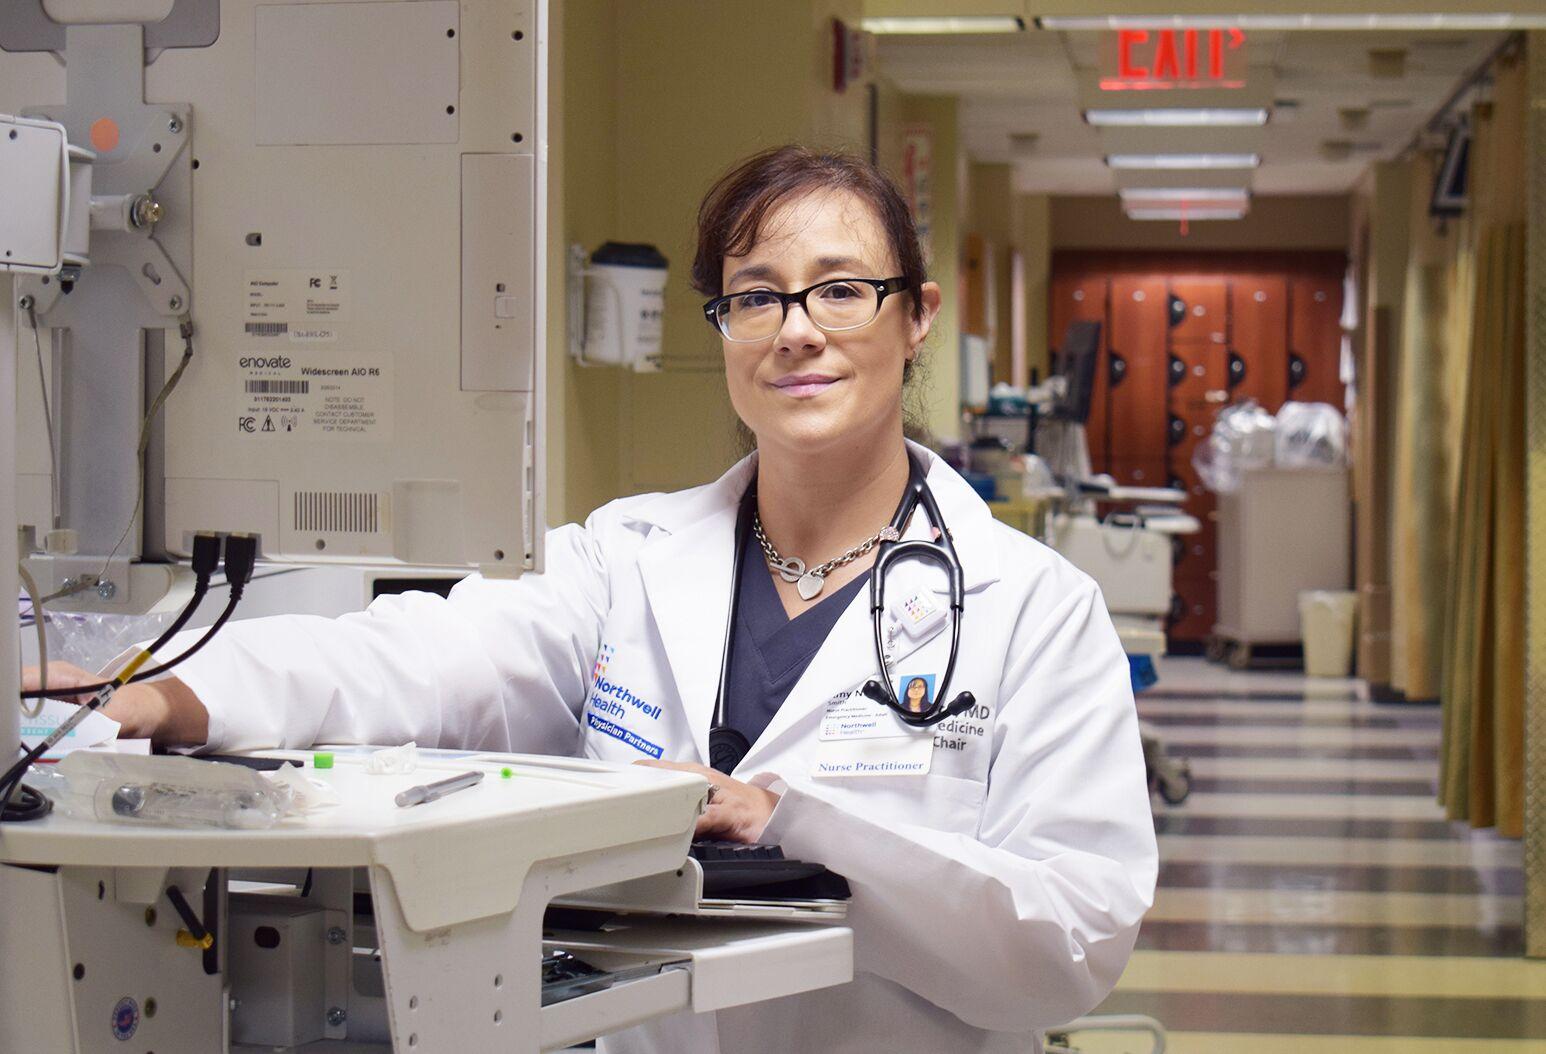 LIJ Forest Hills nurse practitioner Amy Smith.